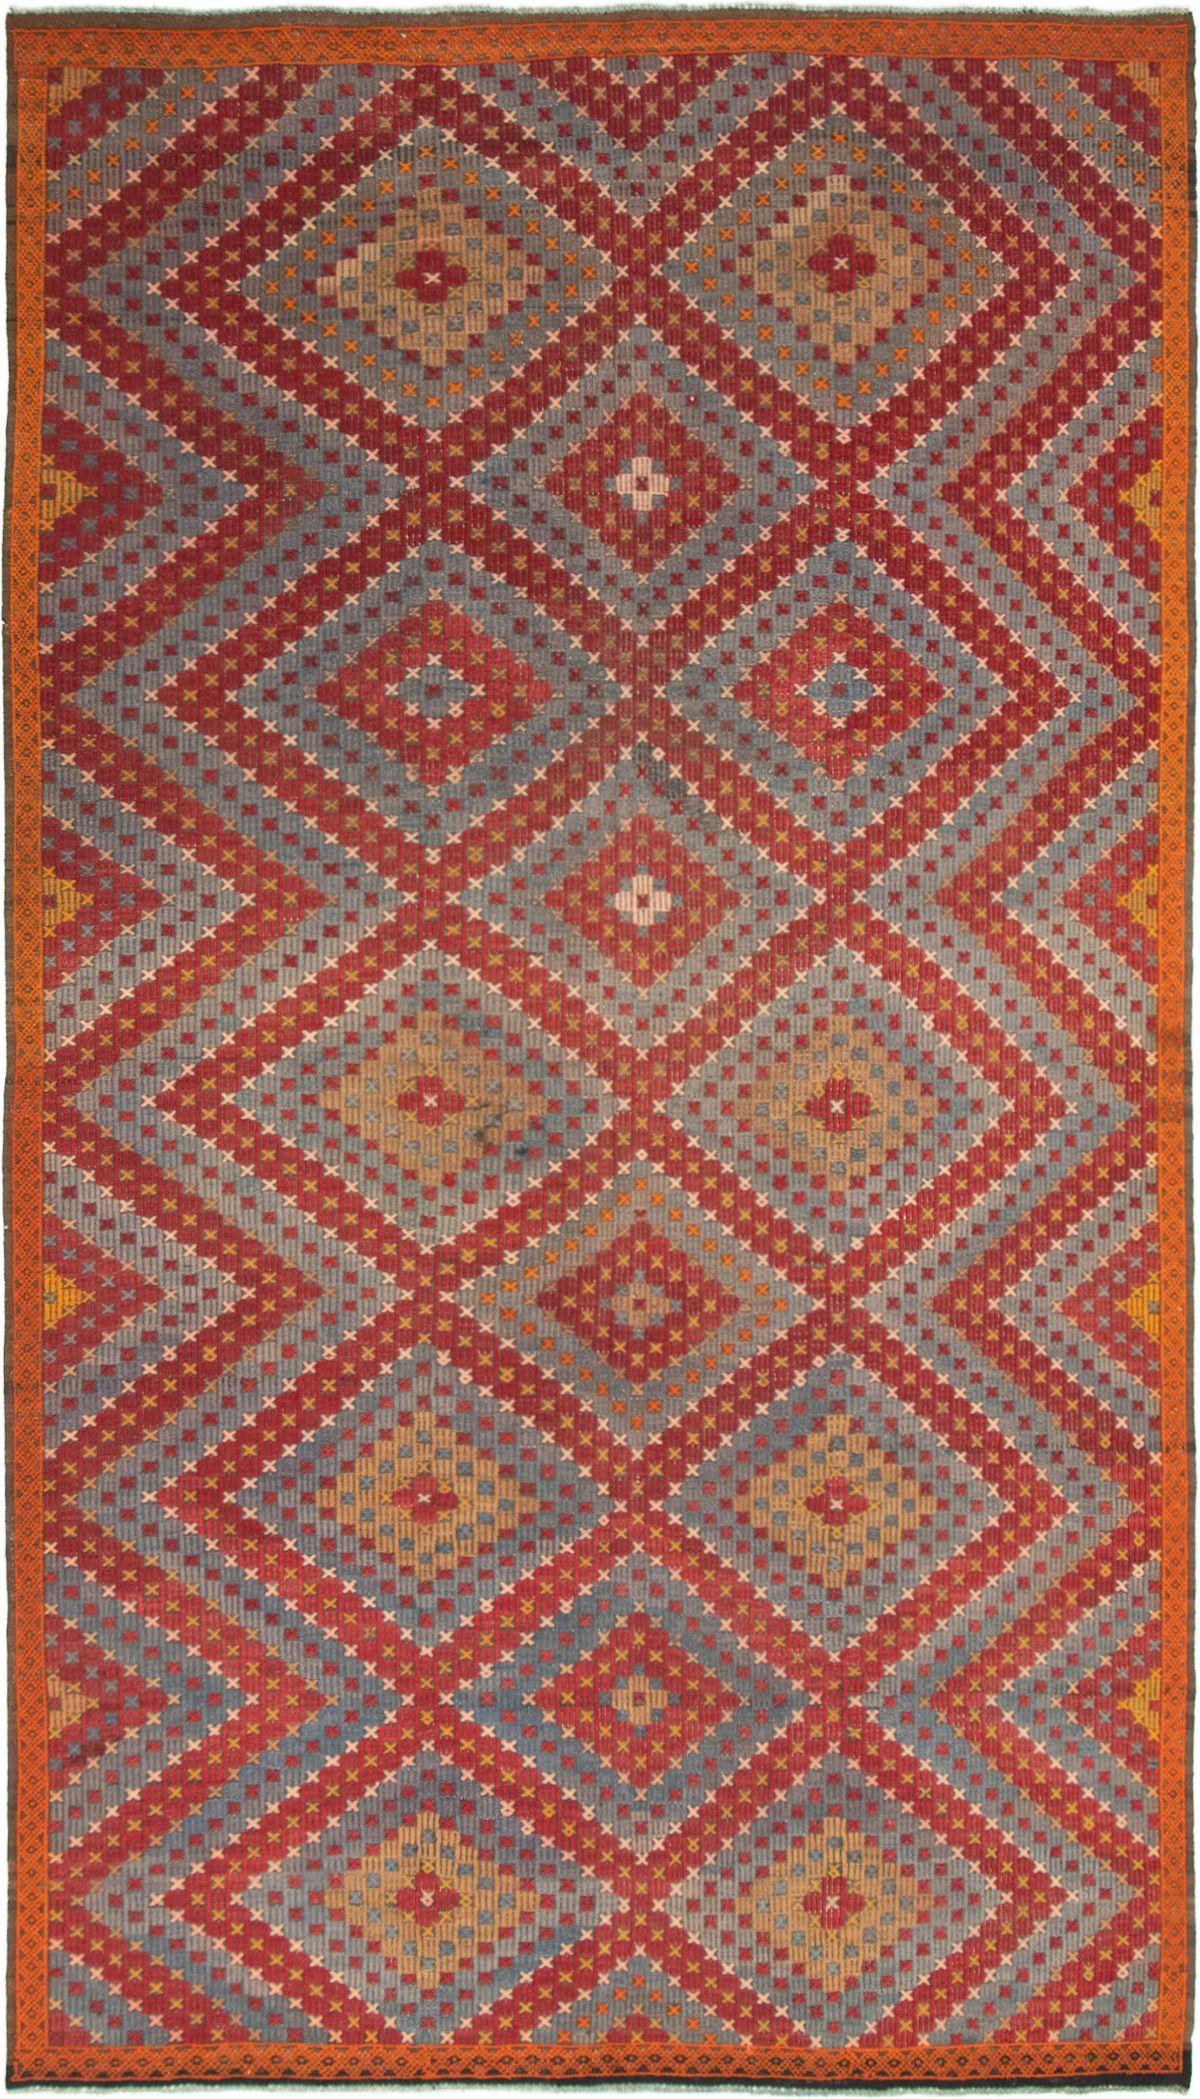 "Hand woven Yoruk Dark Red Wool Tapestry Kilim 6'3"" x 11'2"" Size: 6'3"" x 11'2"""